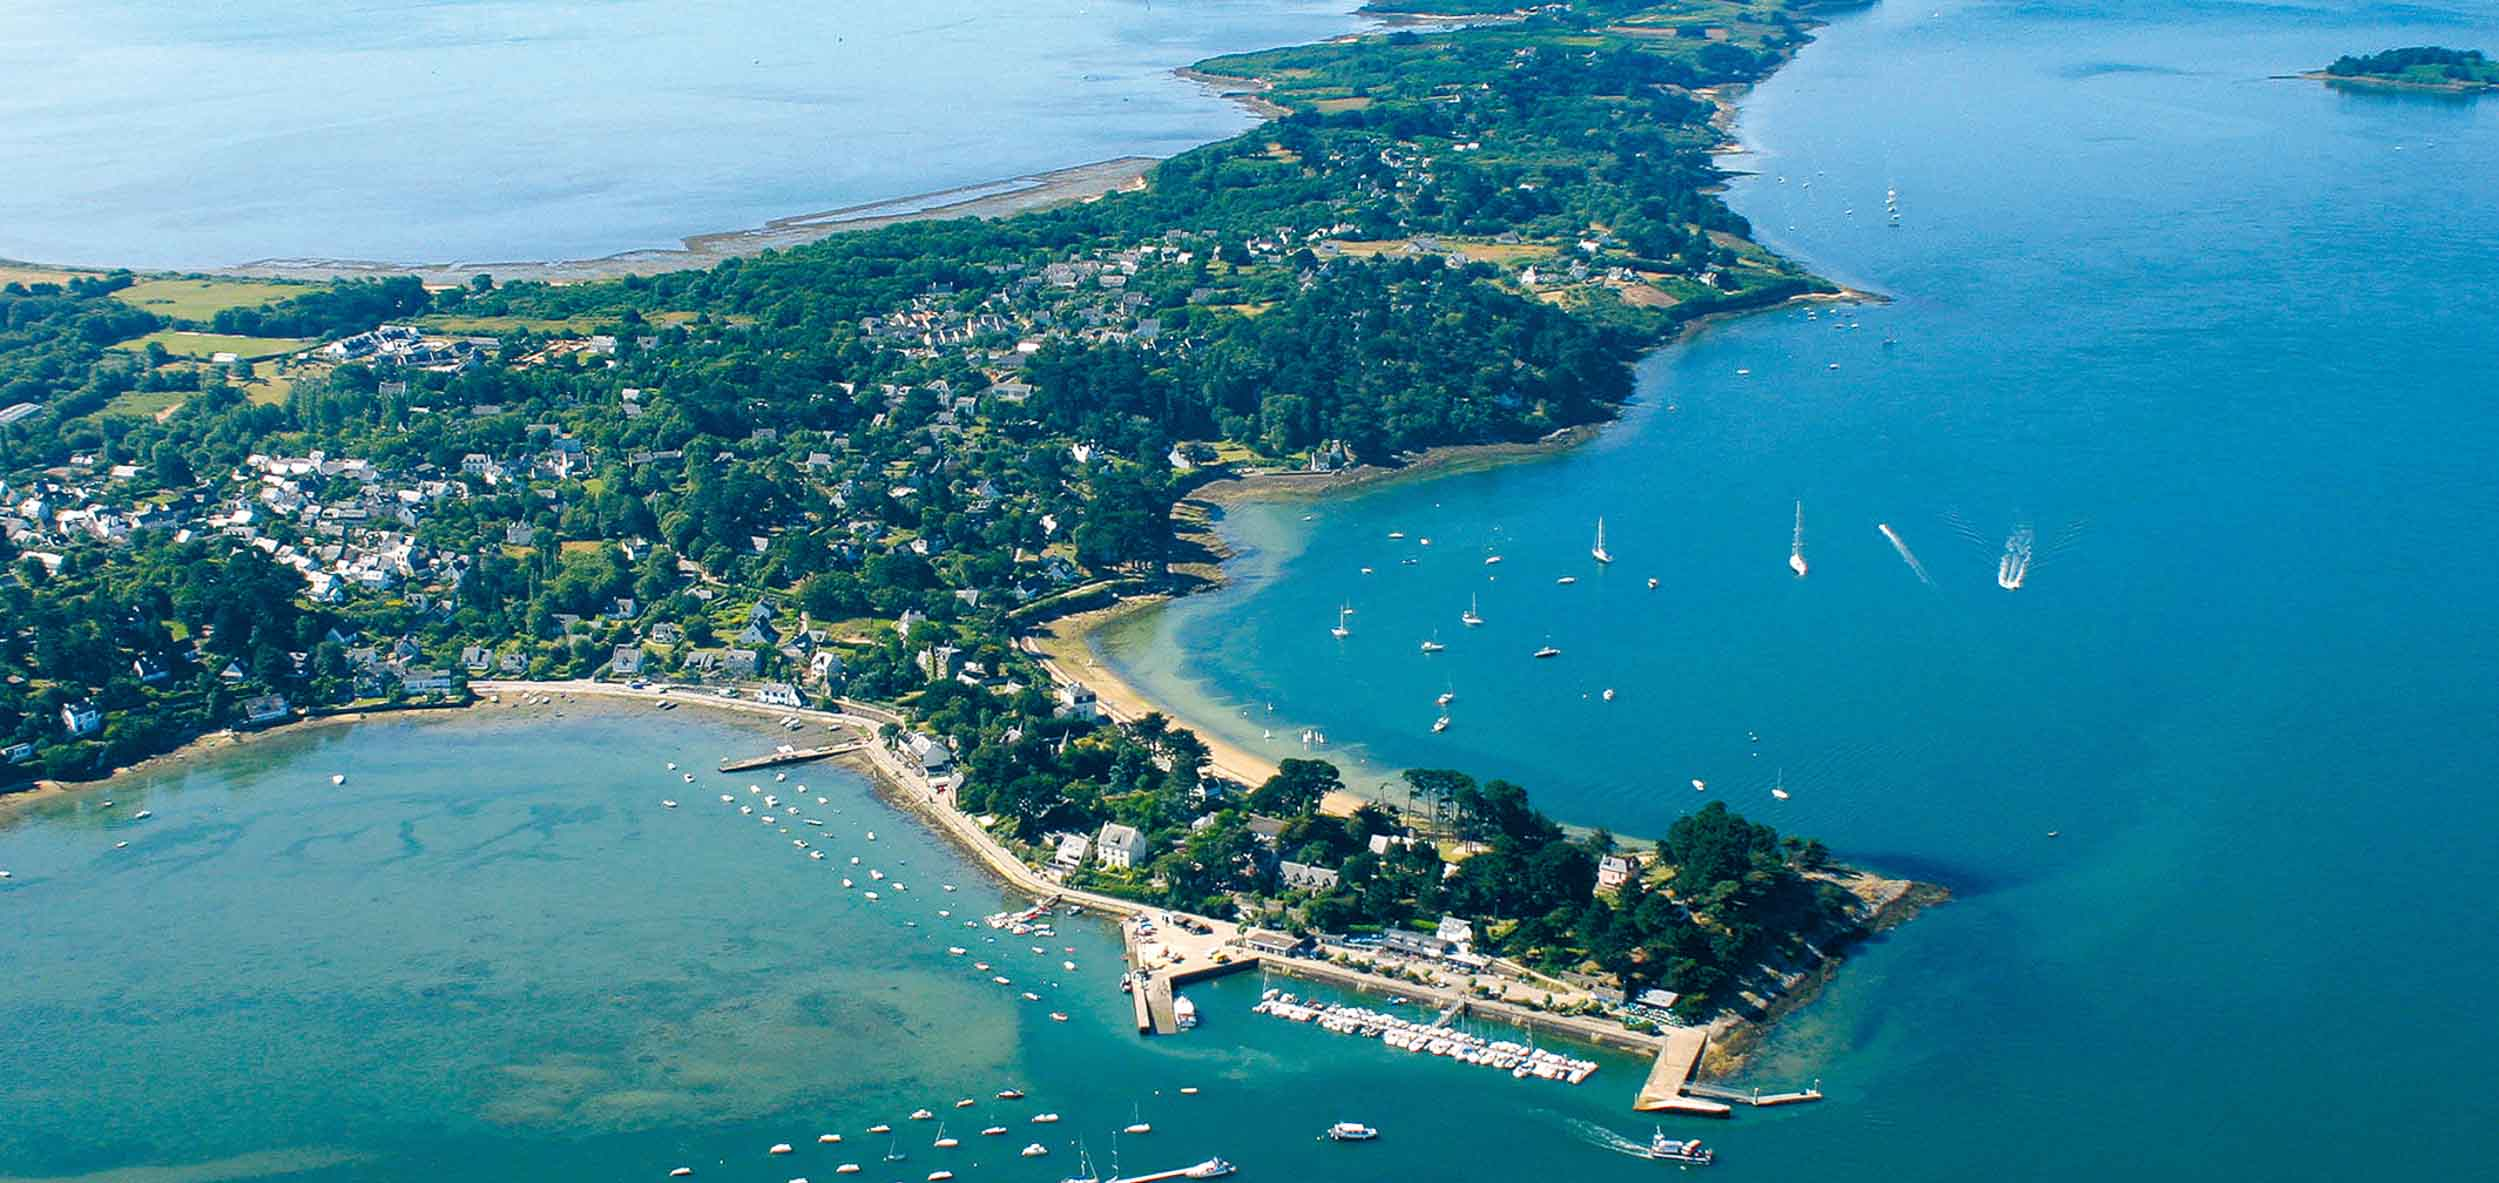 Escapade dans le Golfe du Morbihan #1